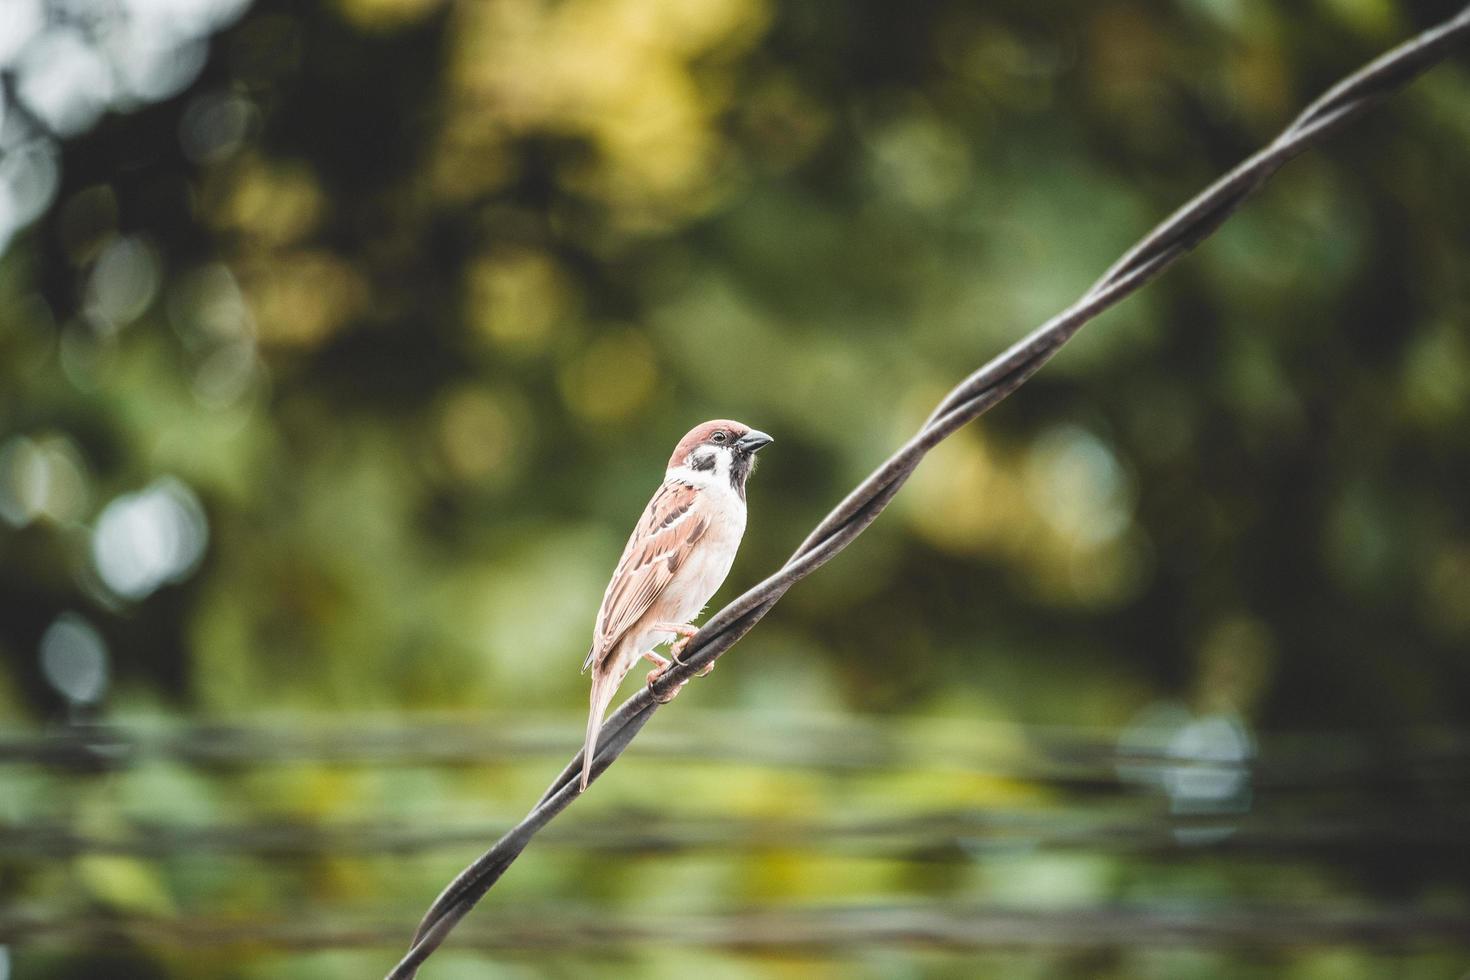 vogel zat op draad foto